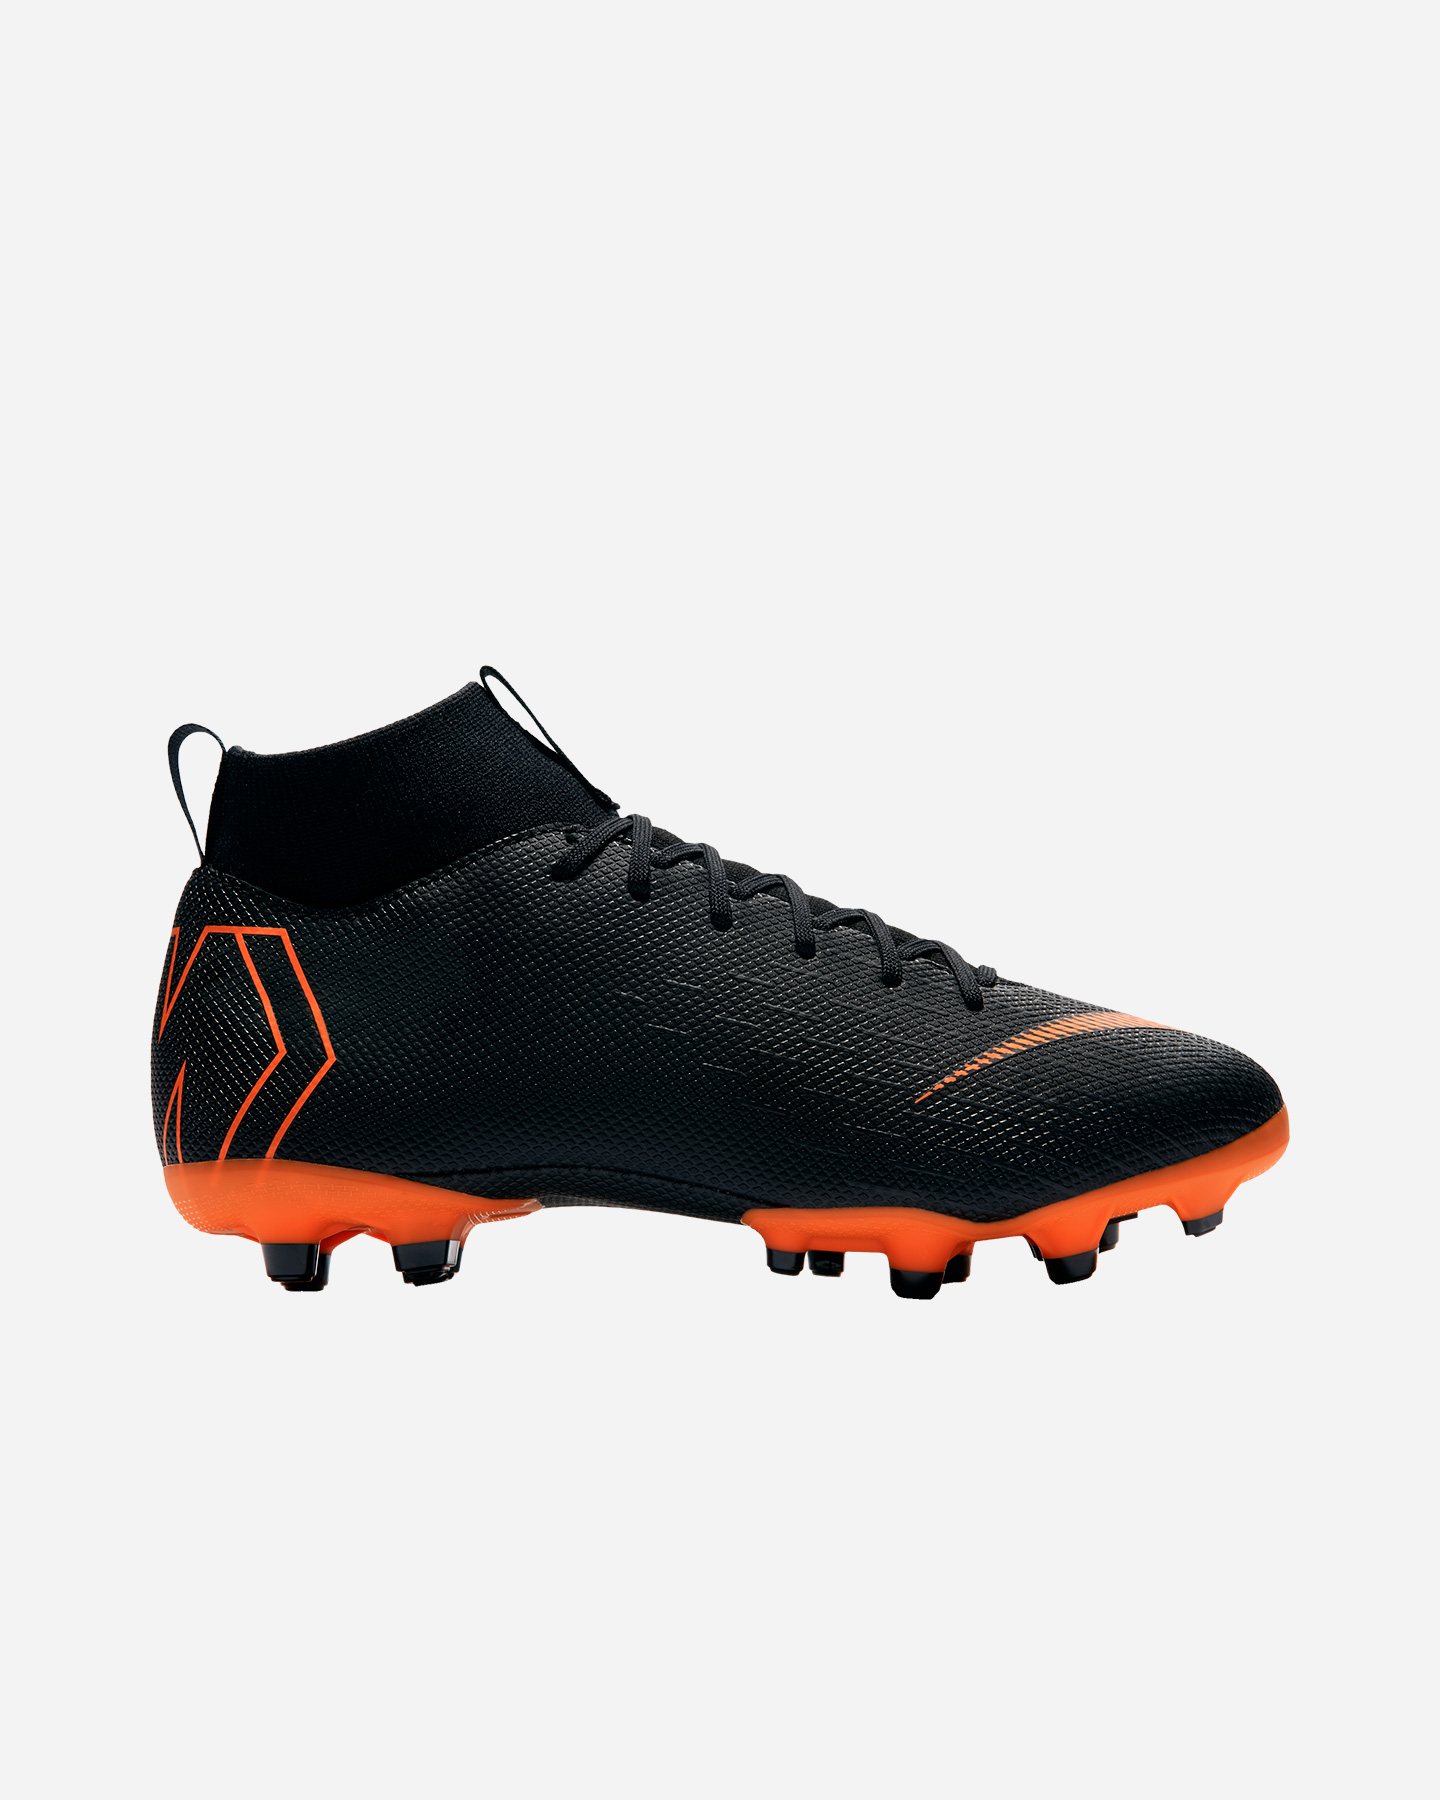 nike calcio 2018 scarpe